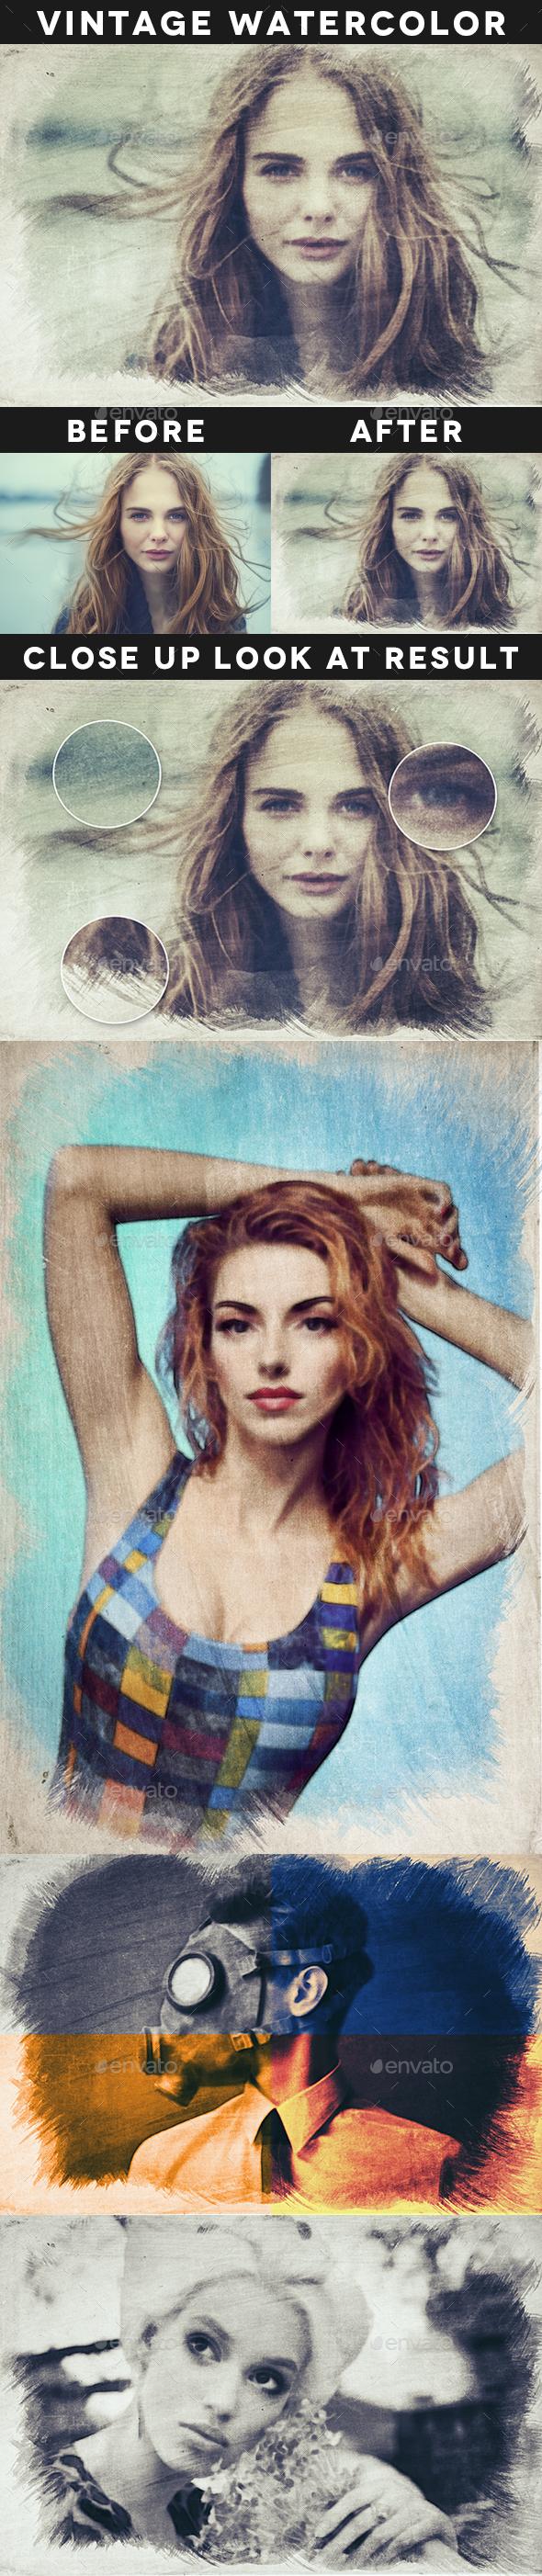 Vintage Watercolor Effect - Artistic Photo Templates